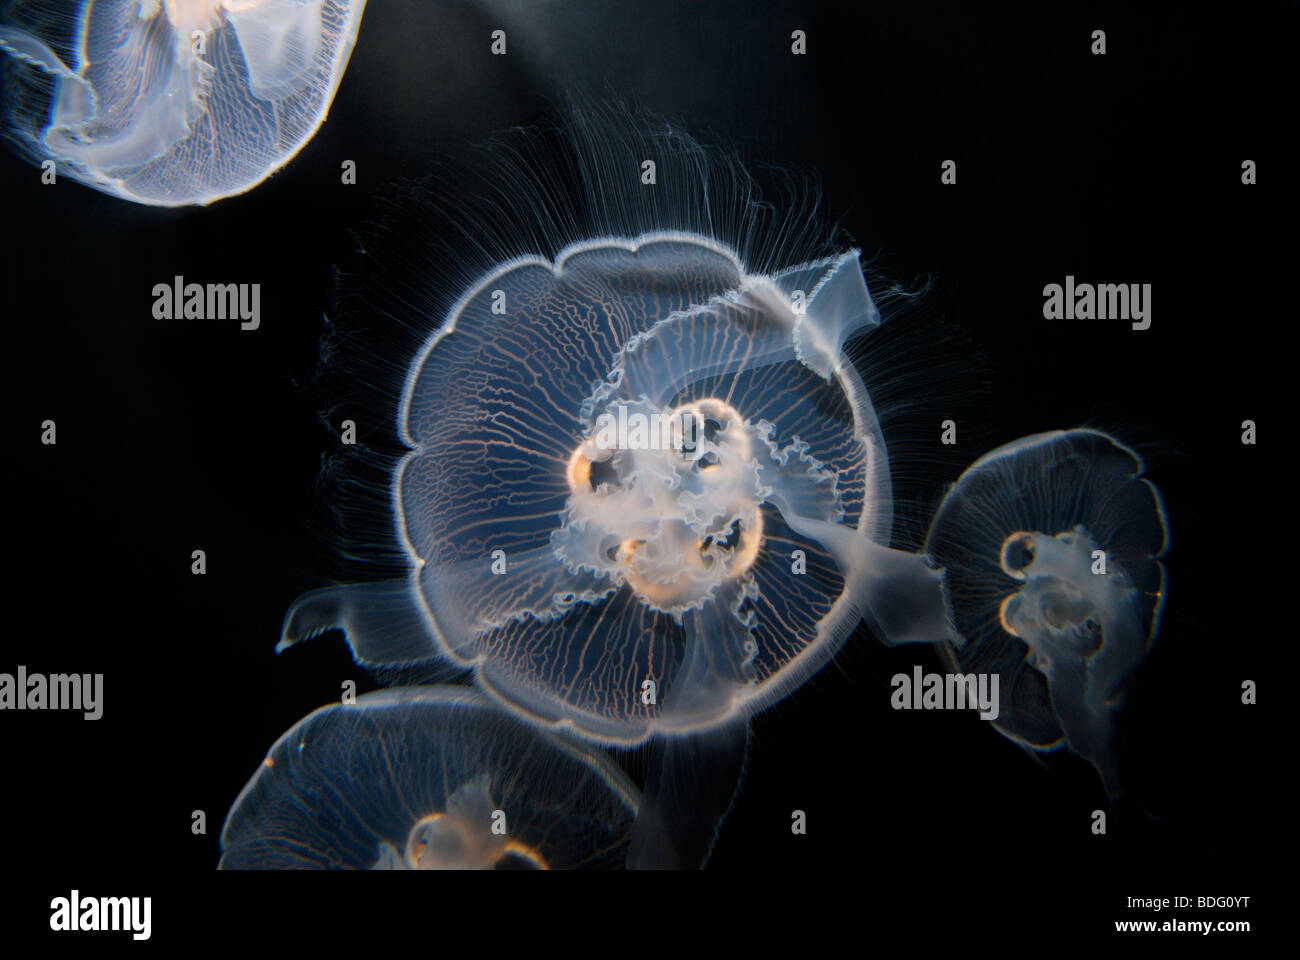 Moon jellyfish,  Aurelia aurita.  Also known as moon jelly, saucer jelly, or common jellyfish - Stock Image